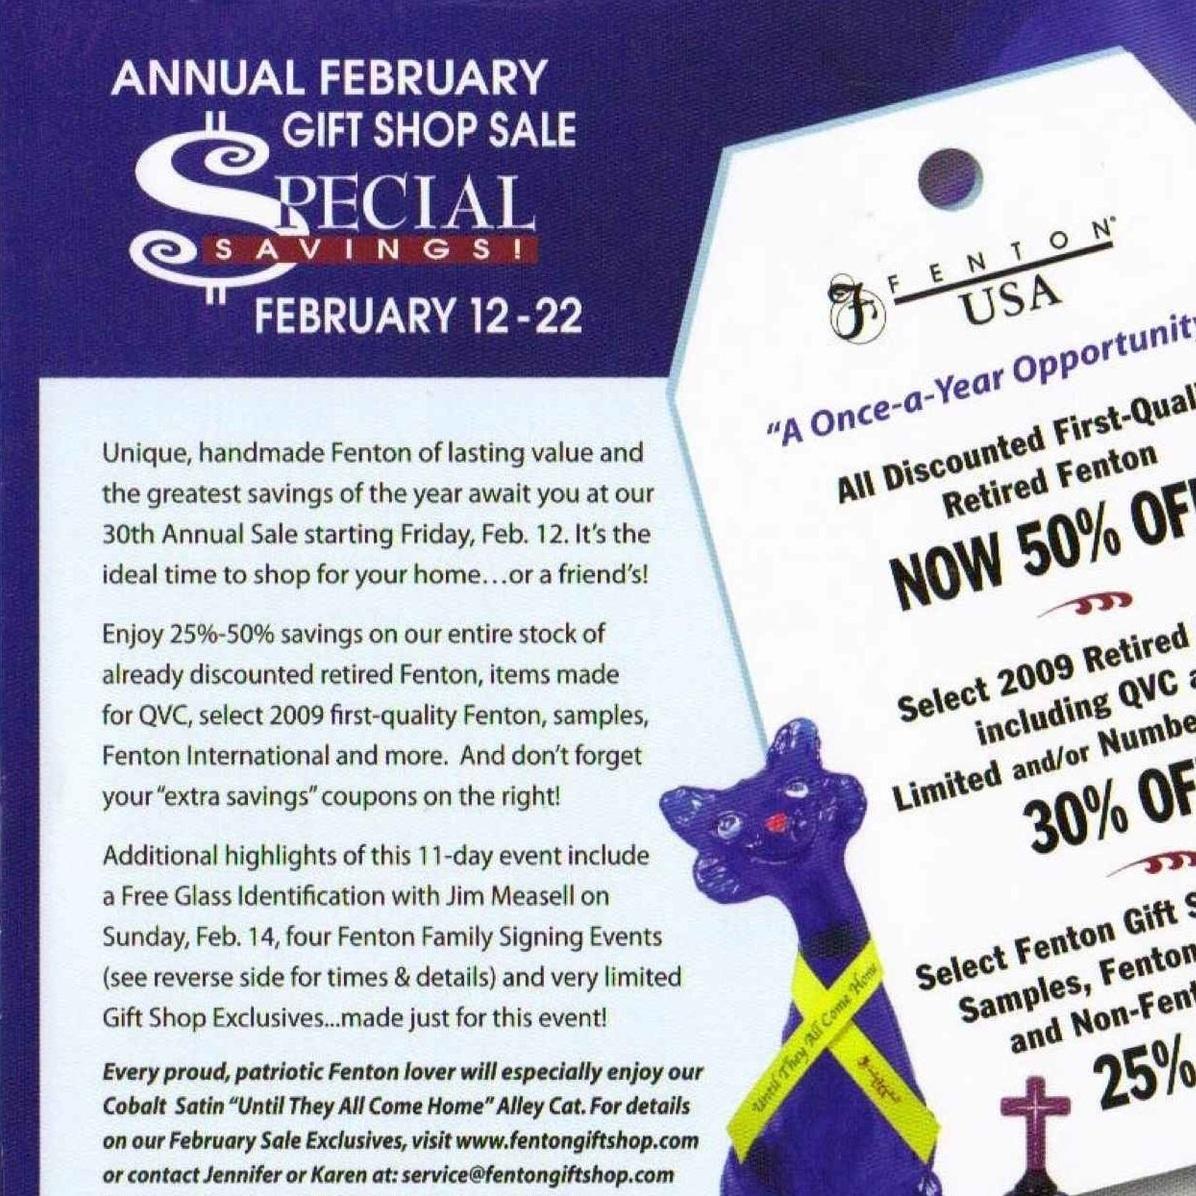 2010 Feb Gift Shop Sale